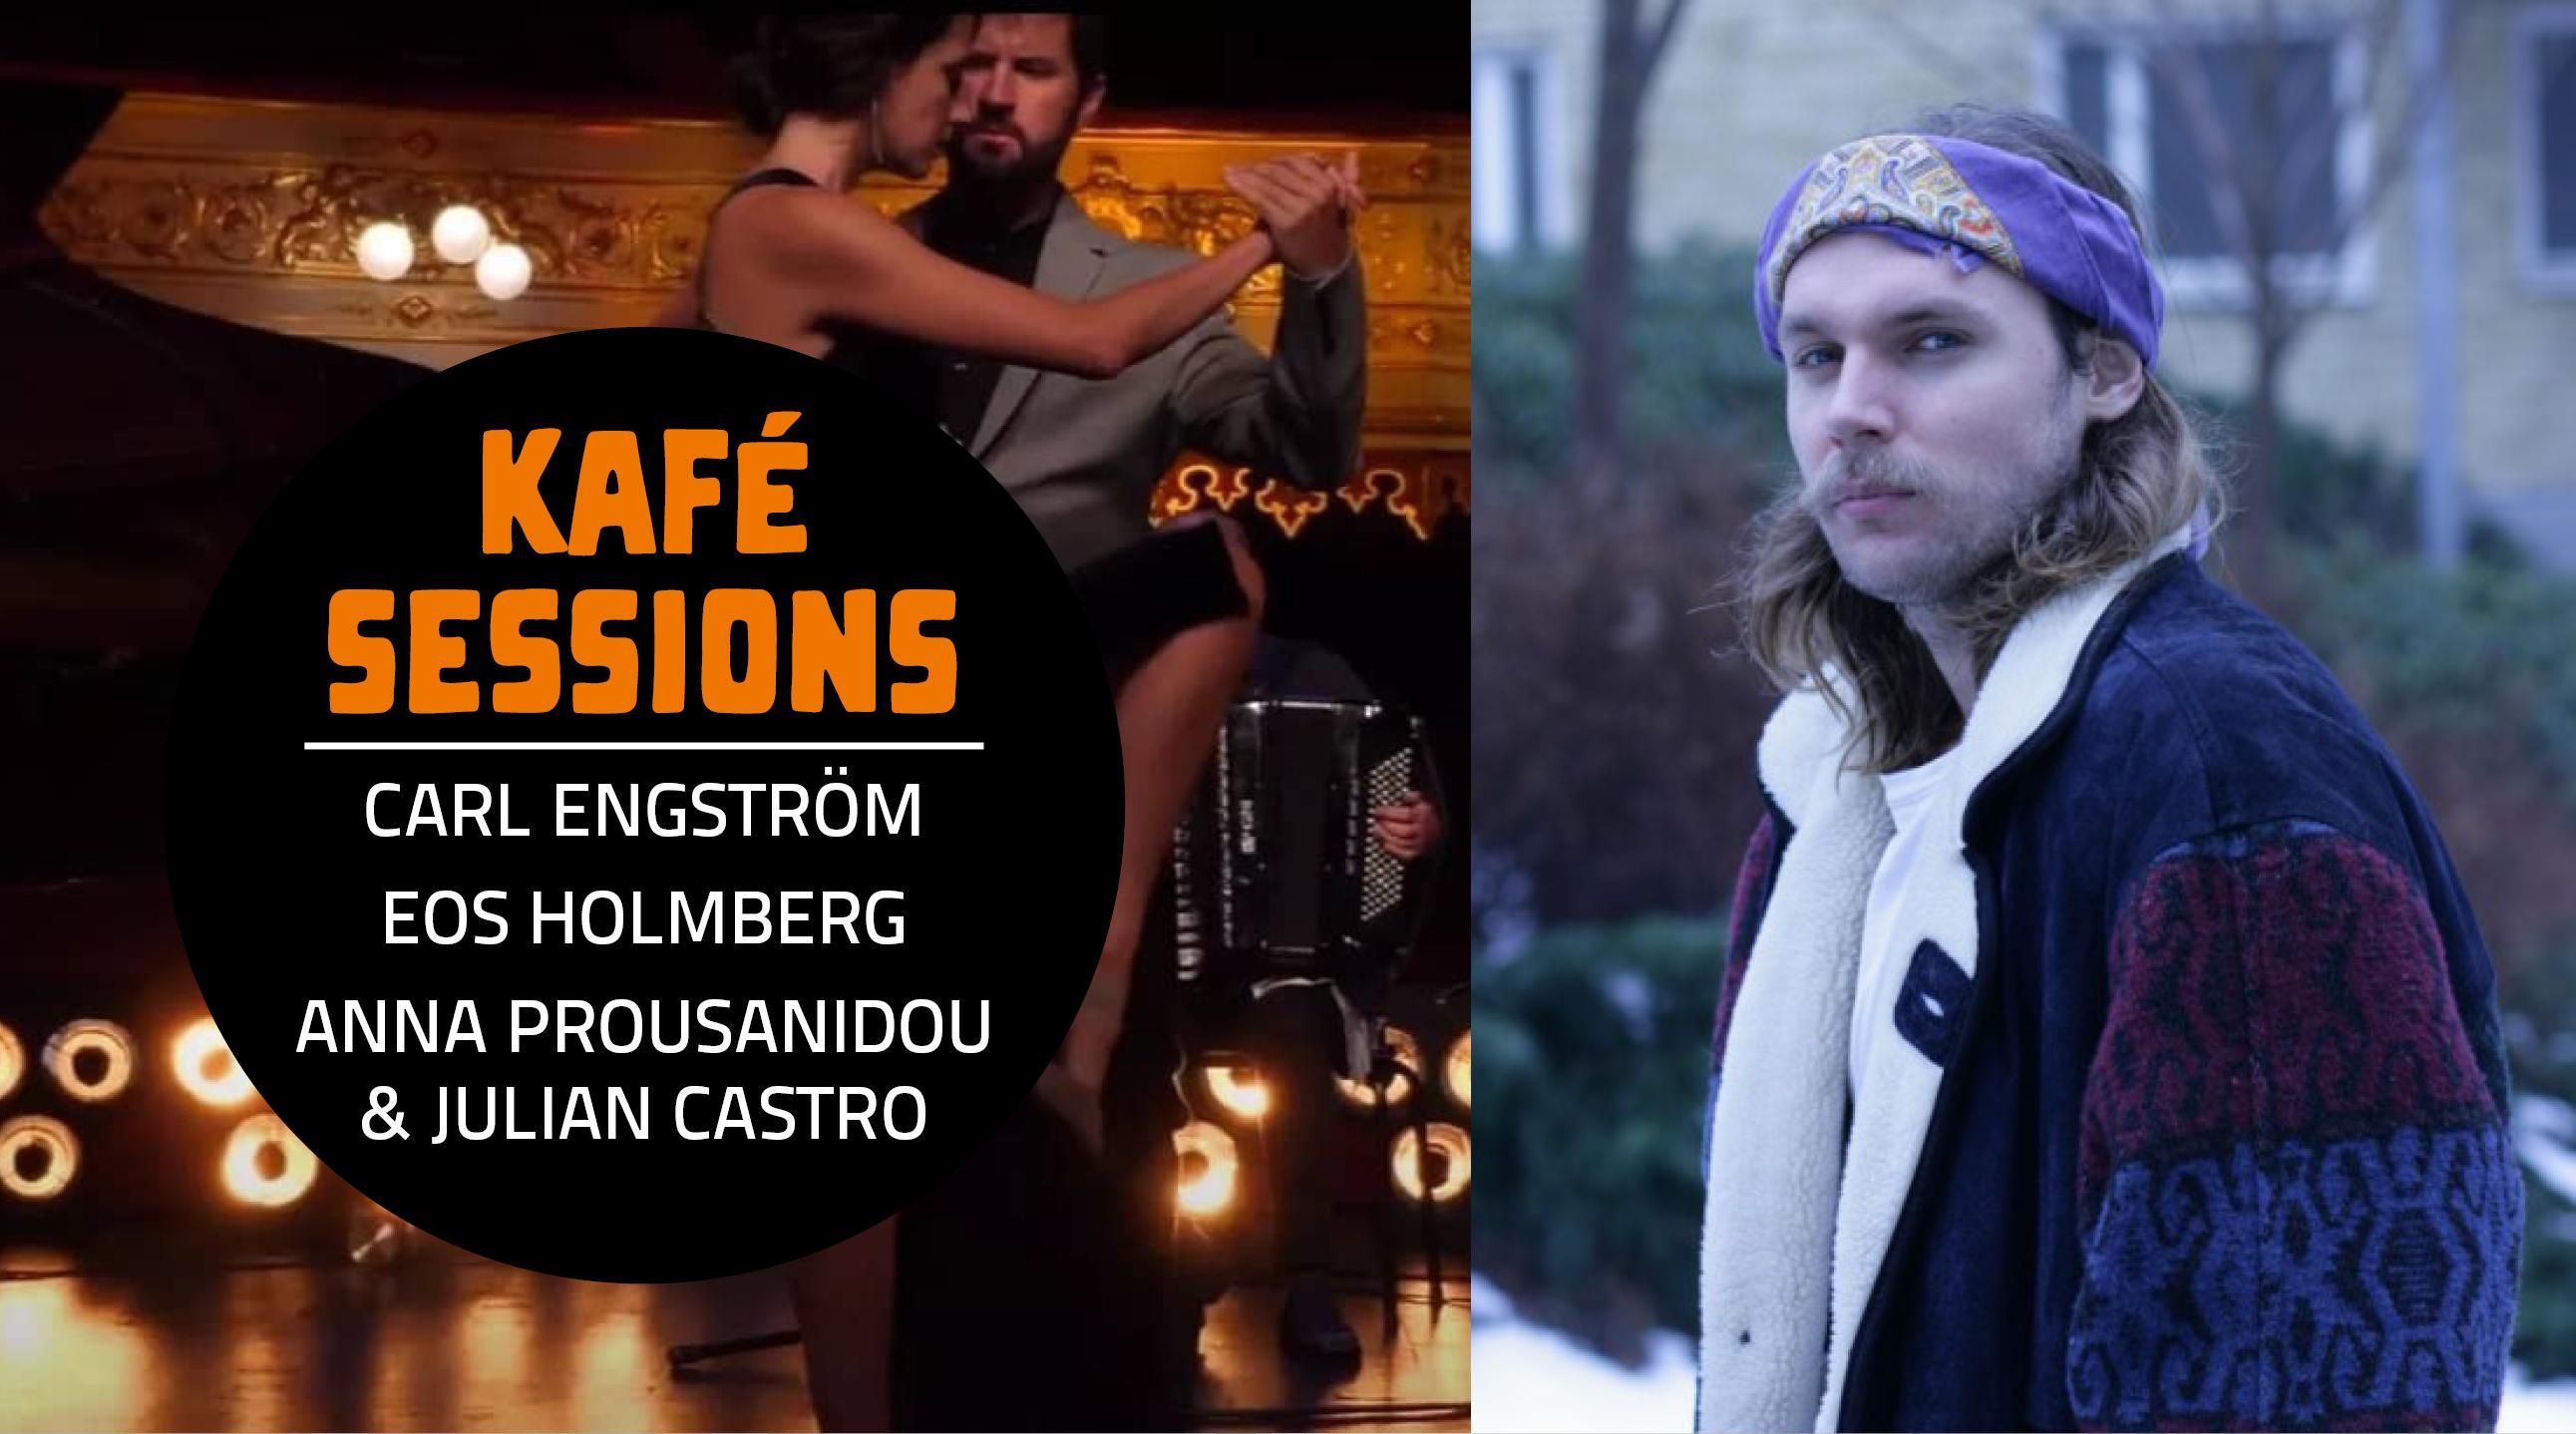 Kafé Sessions: Carl Engström, Eos Holmberg, Anna Prousanidou & Julian Castro